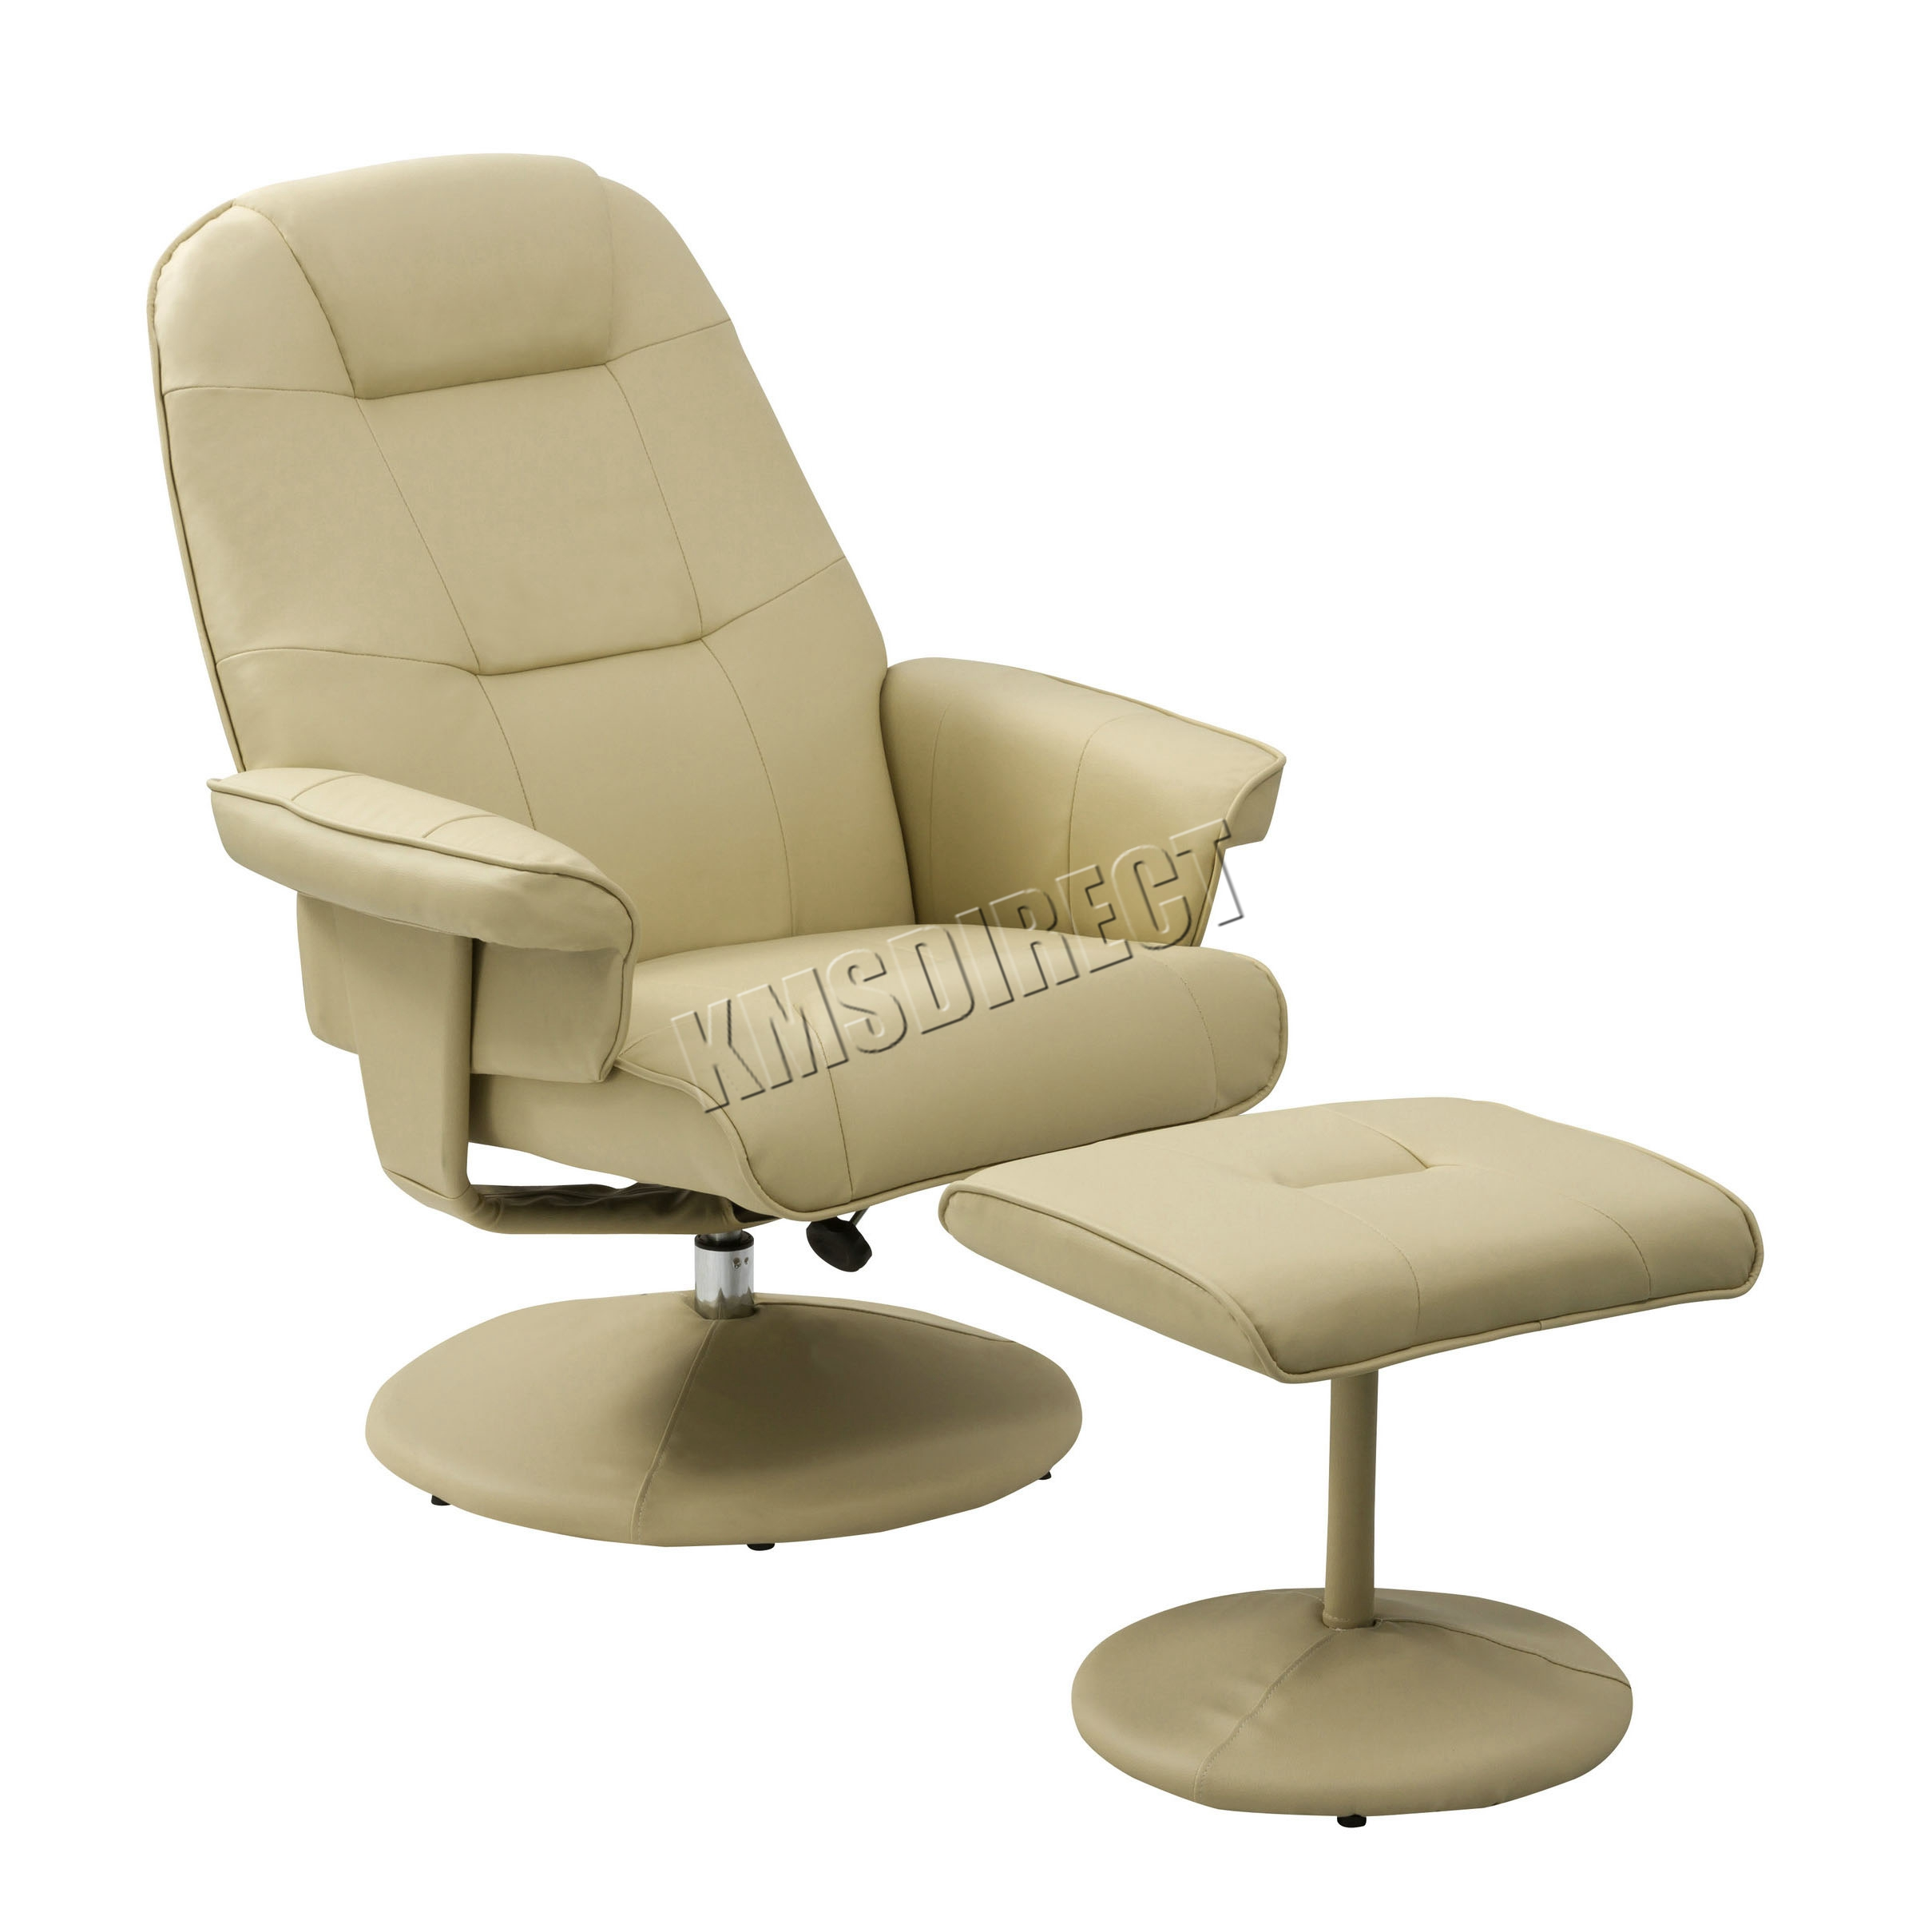 Thumbnail  sc 1 st  eBay & FoxHunter Executive Recliner PU Arm Chair Swivel Lounger Seat Foot ... islam-shia.org